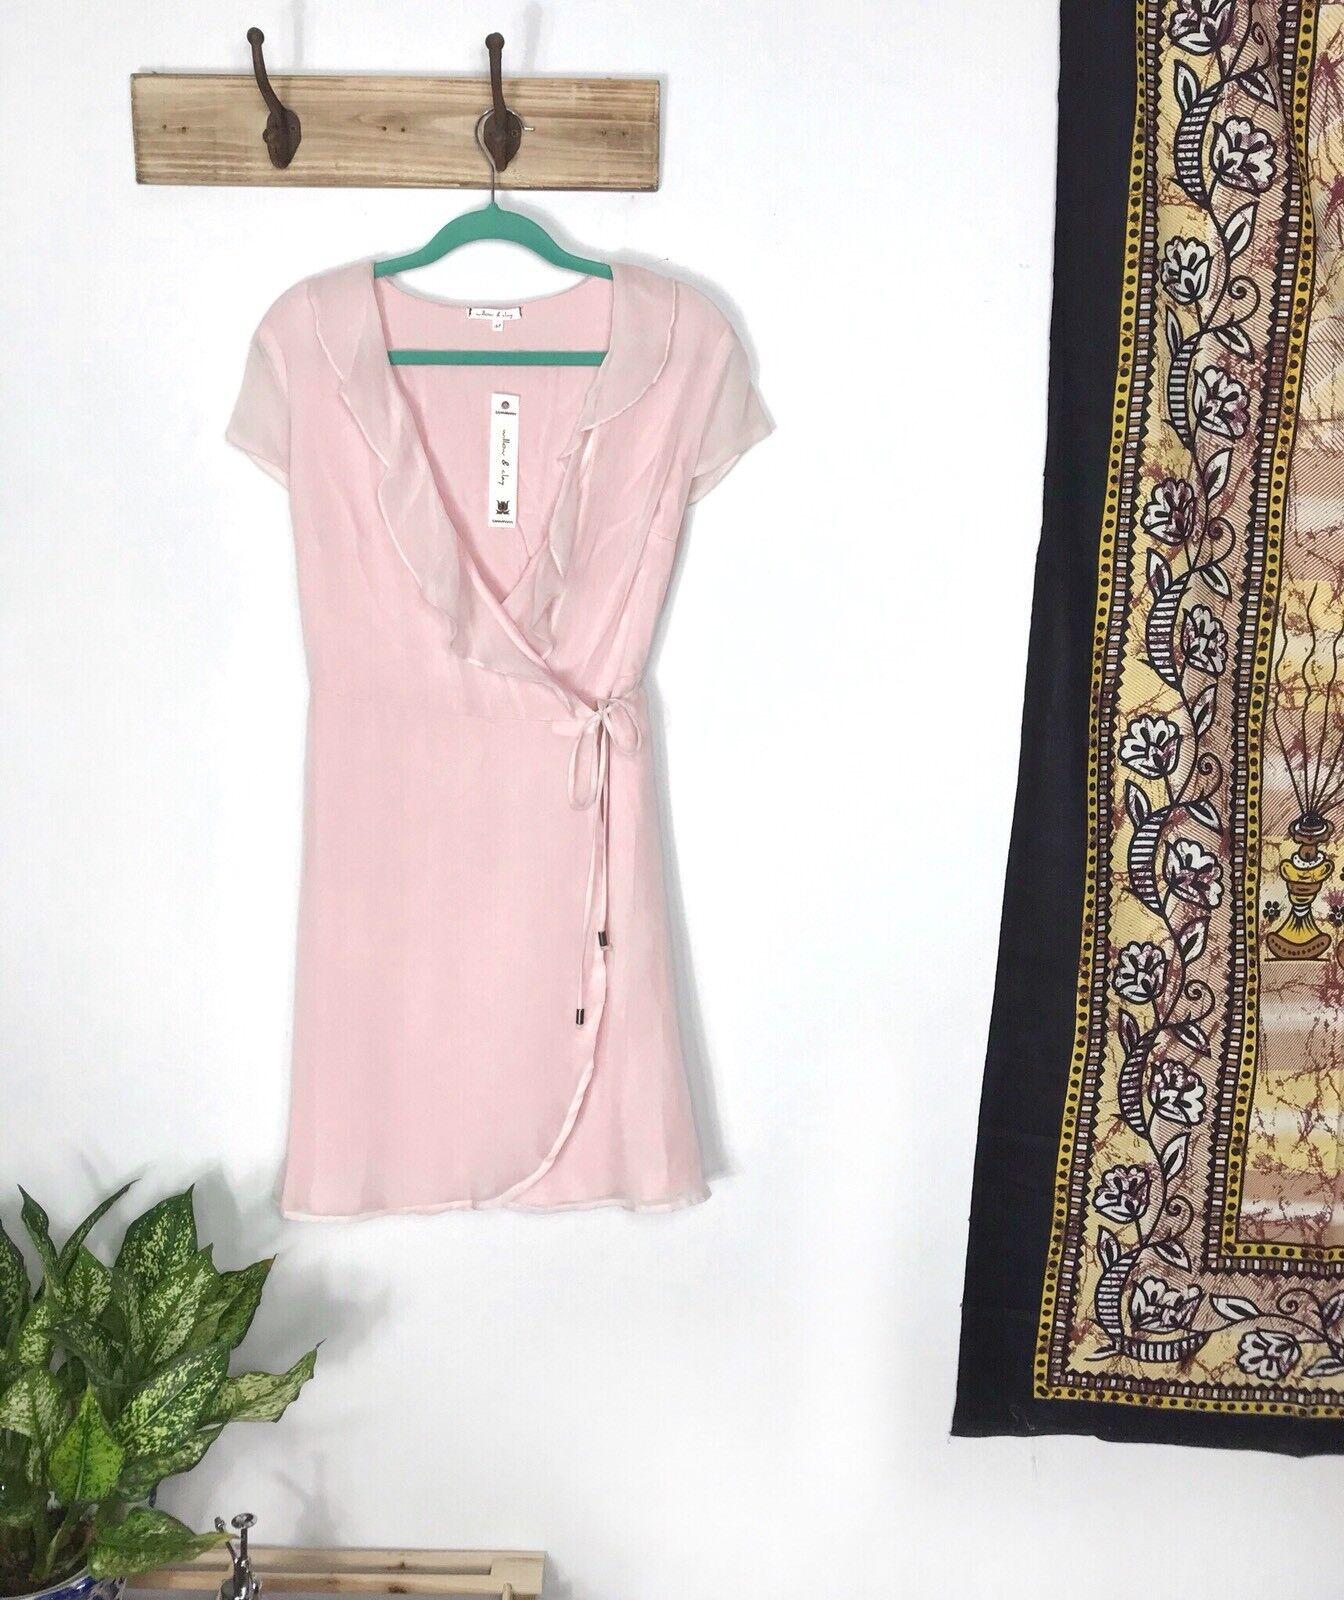 Willow & Clay M dress Pink Ruffle Short-Sleeve Wrap Around bluesh NEW